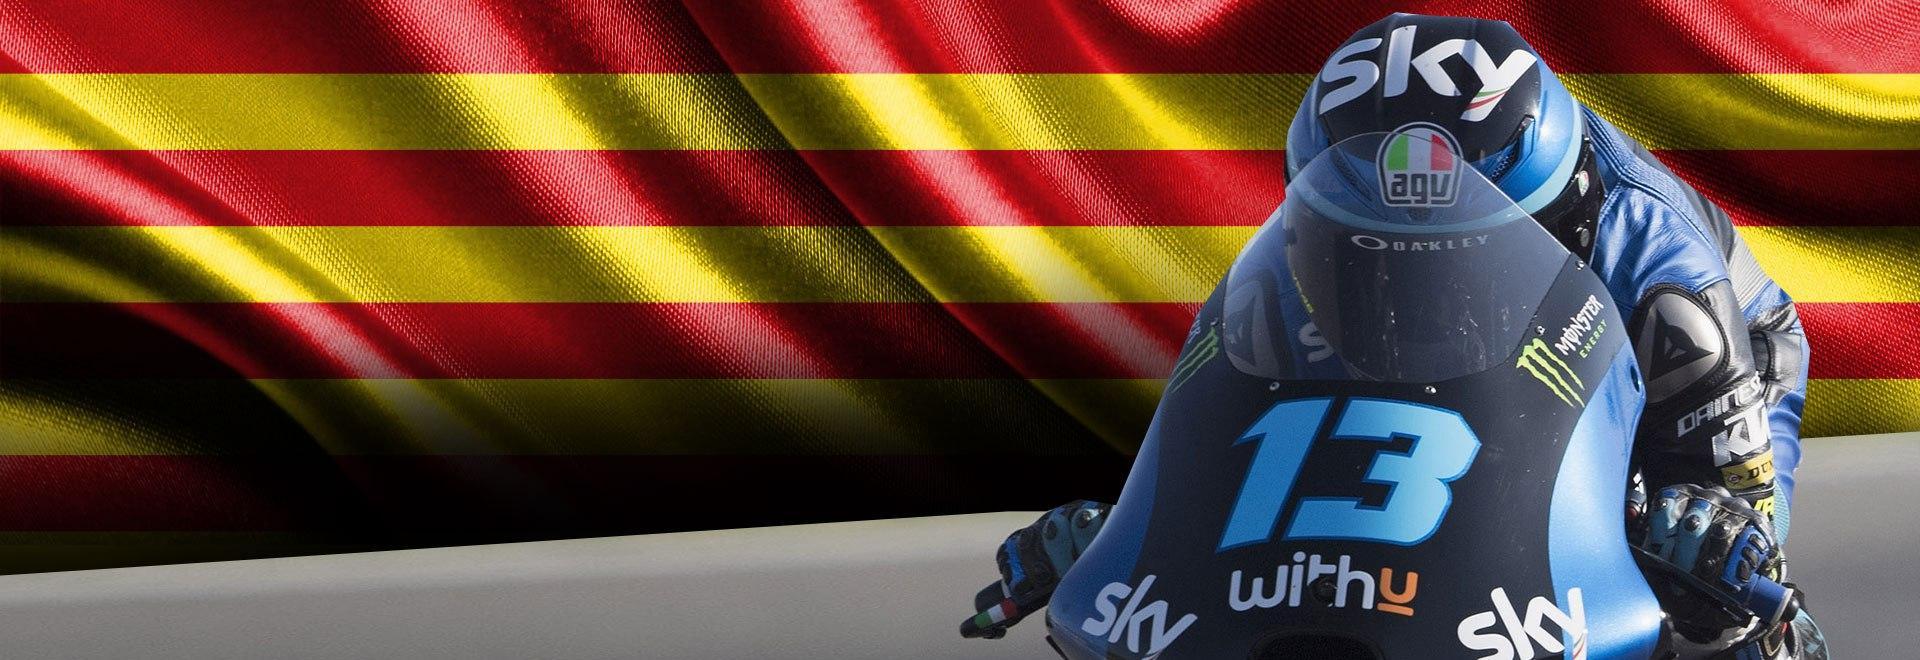 GP Catalunya. Qualifiche